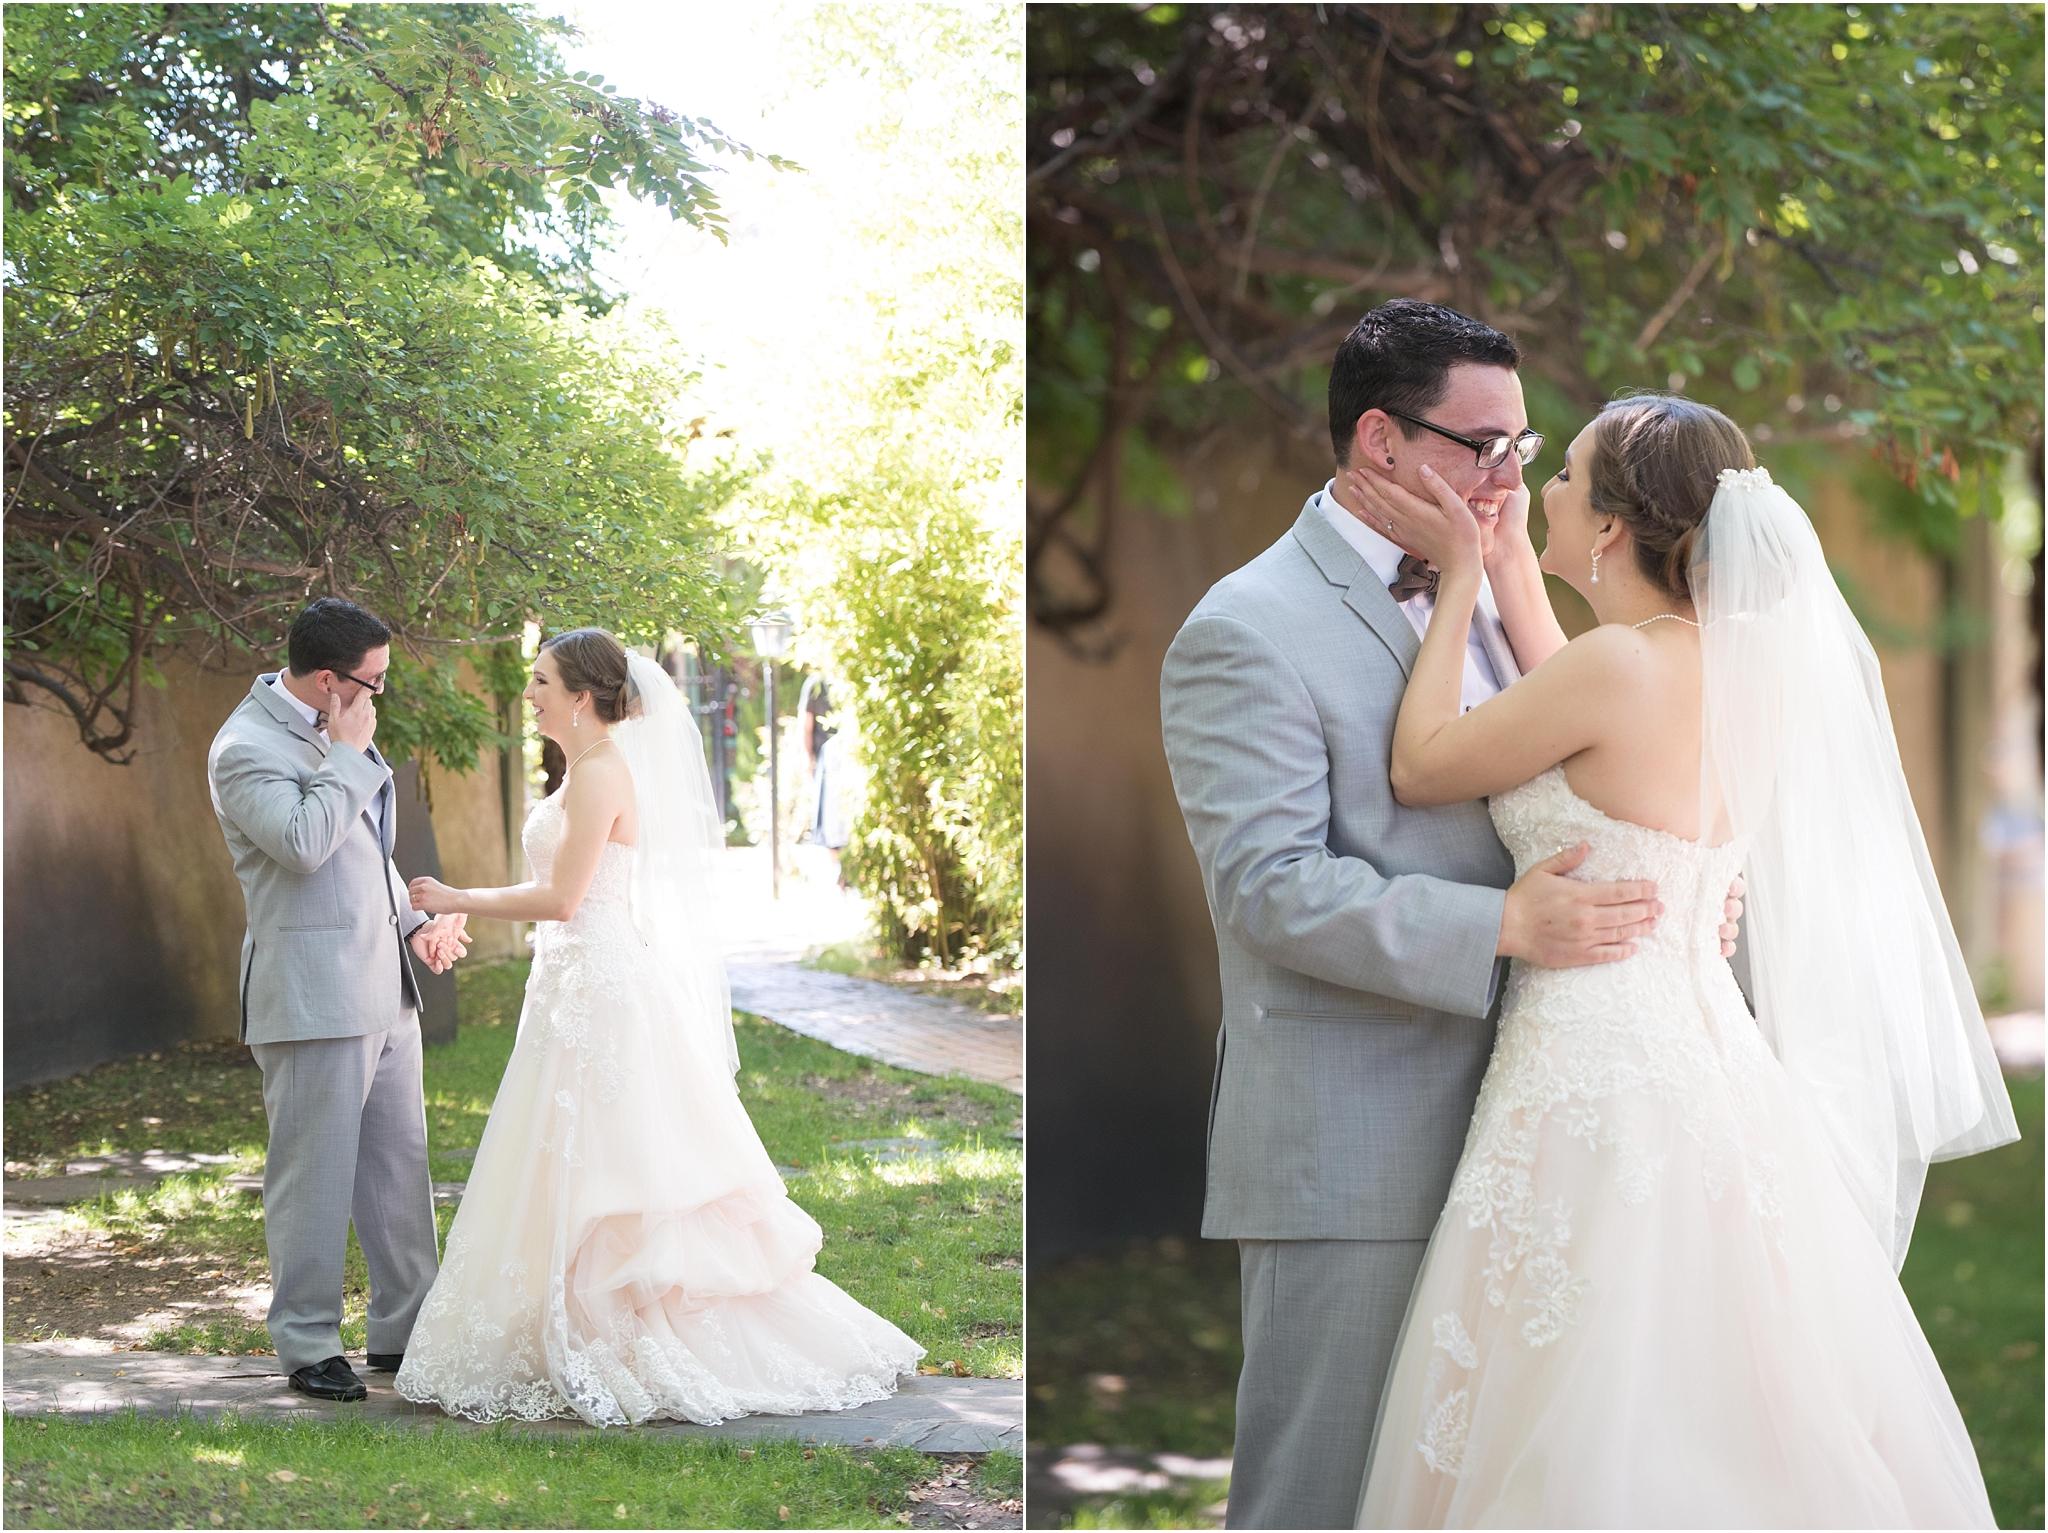 casas de suenos albuquerque new mexico wedding photographer venue courtyard outdoor ceremony reception best abq venue kayla kitts